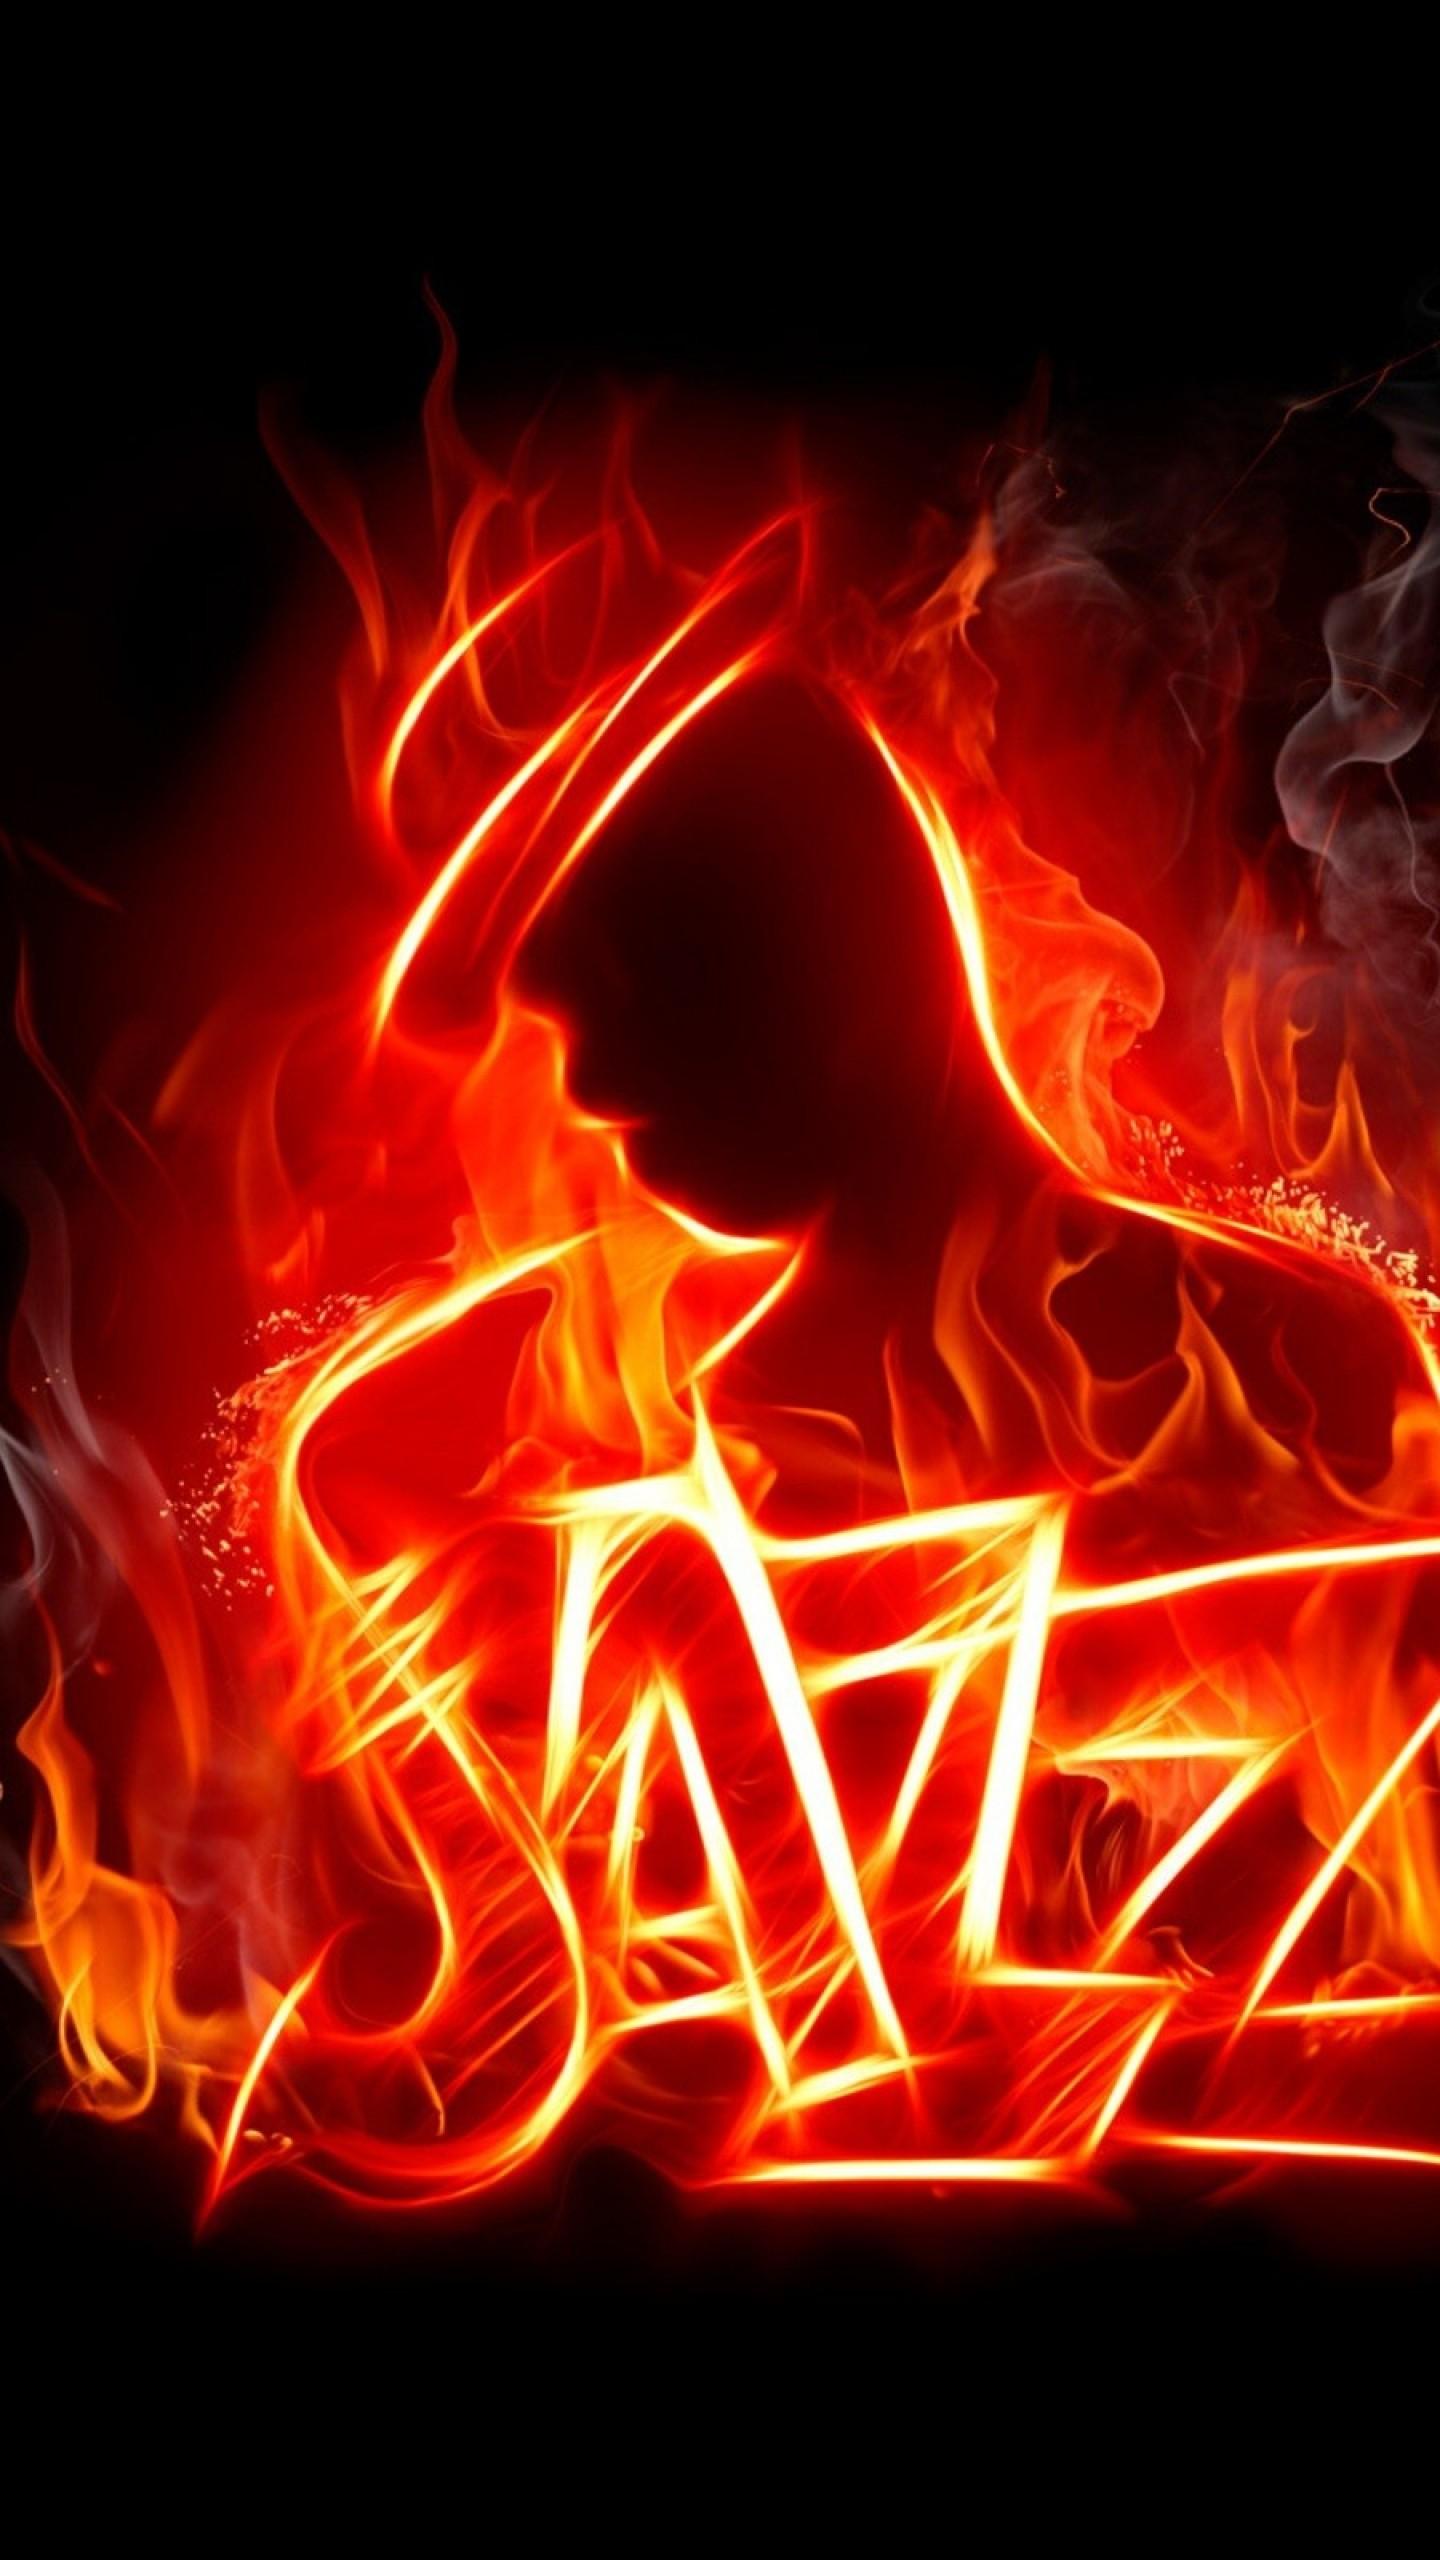 Wallpaper jazz, music, fire, silhouette, jazzman